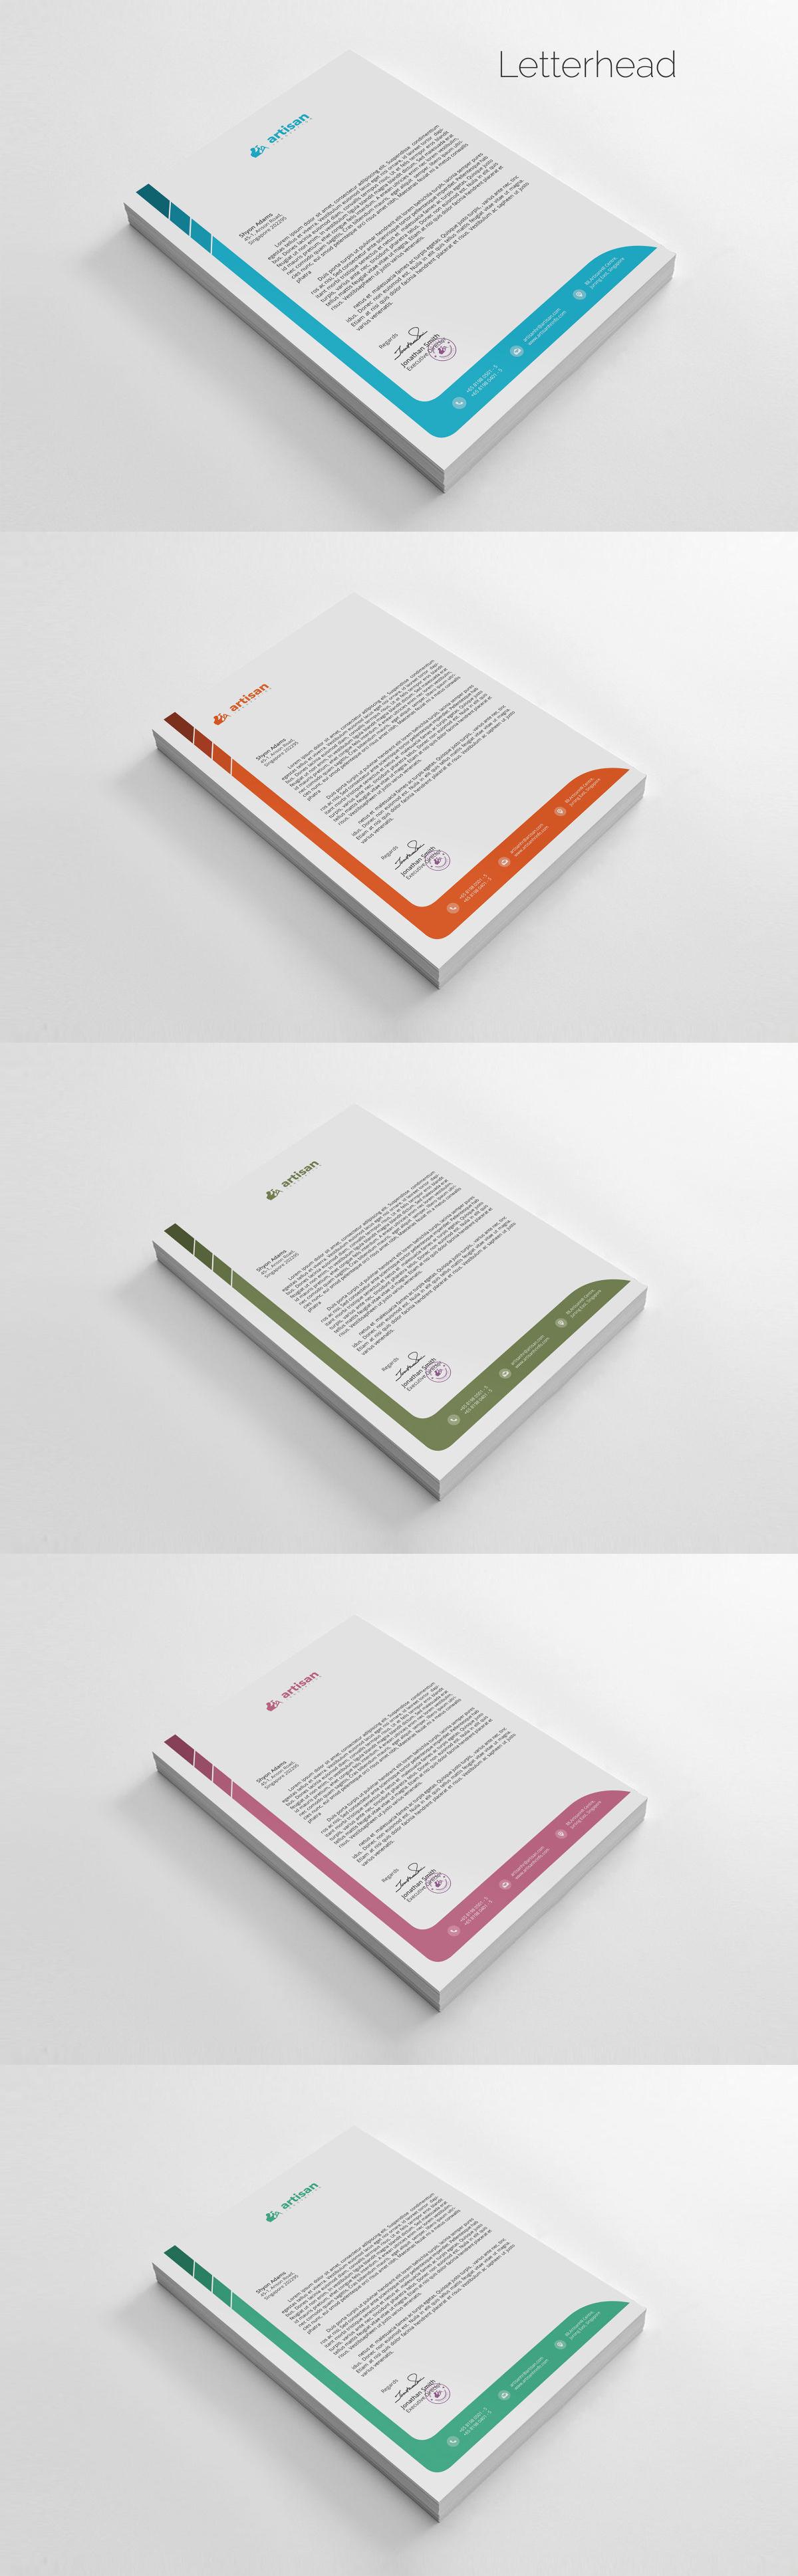 Letterhead design template ai eps pdf psd ms word letterhead letterhead design template ai eps pdf psd ms word spiritdancerdesigns Gallery